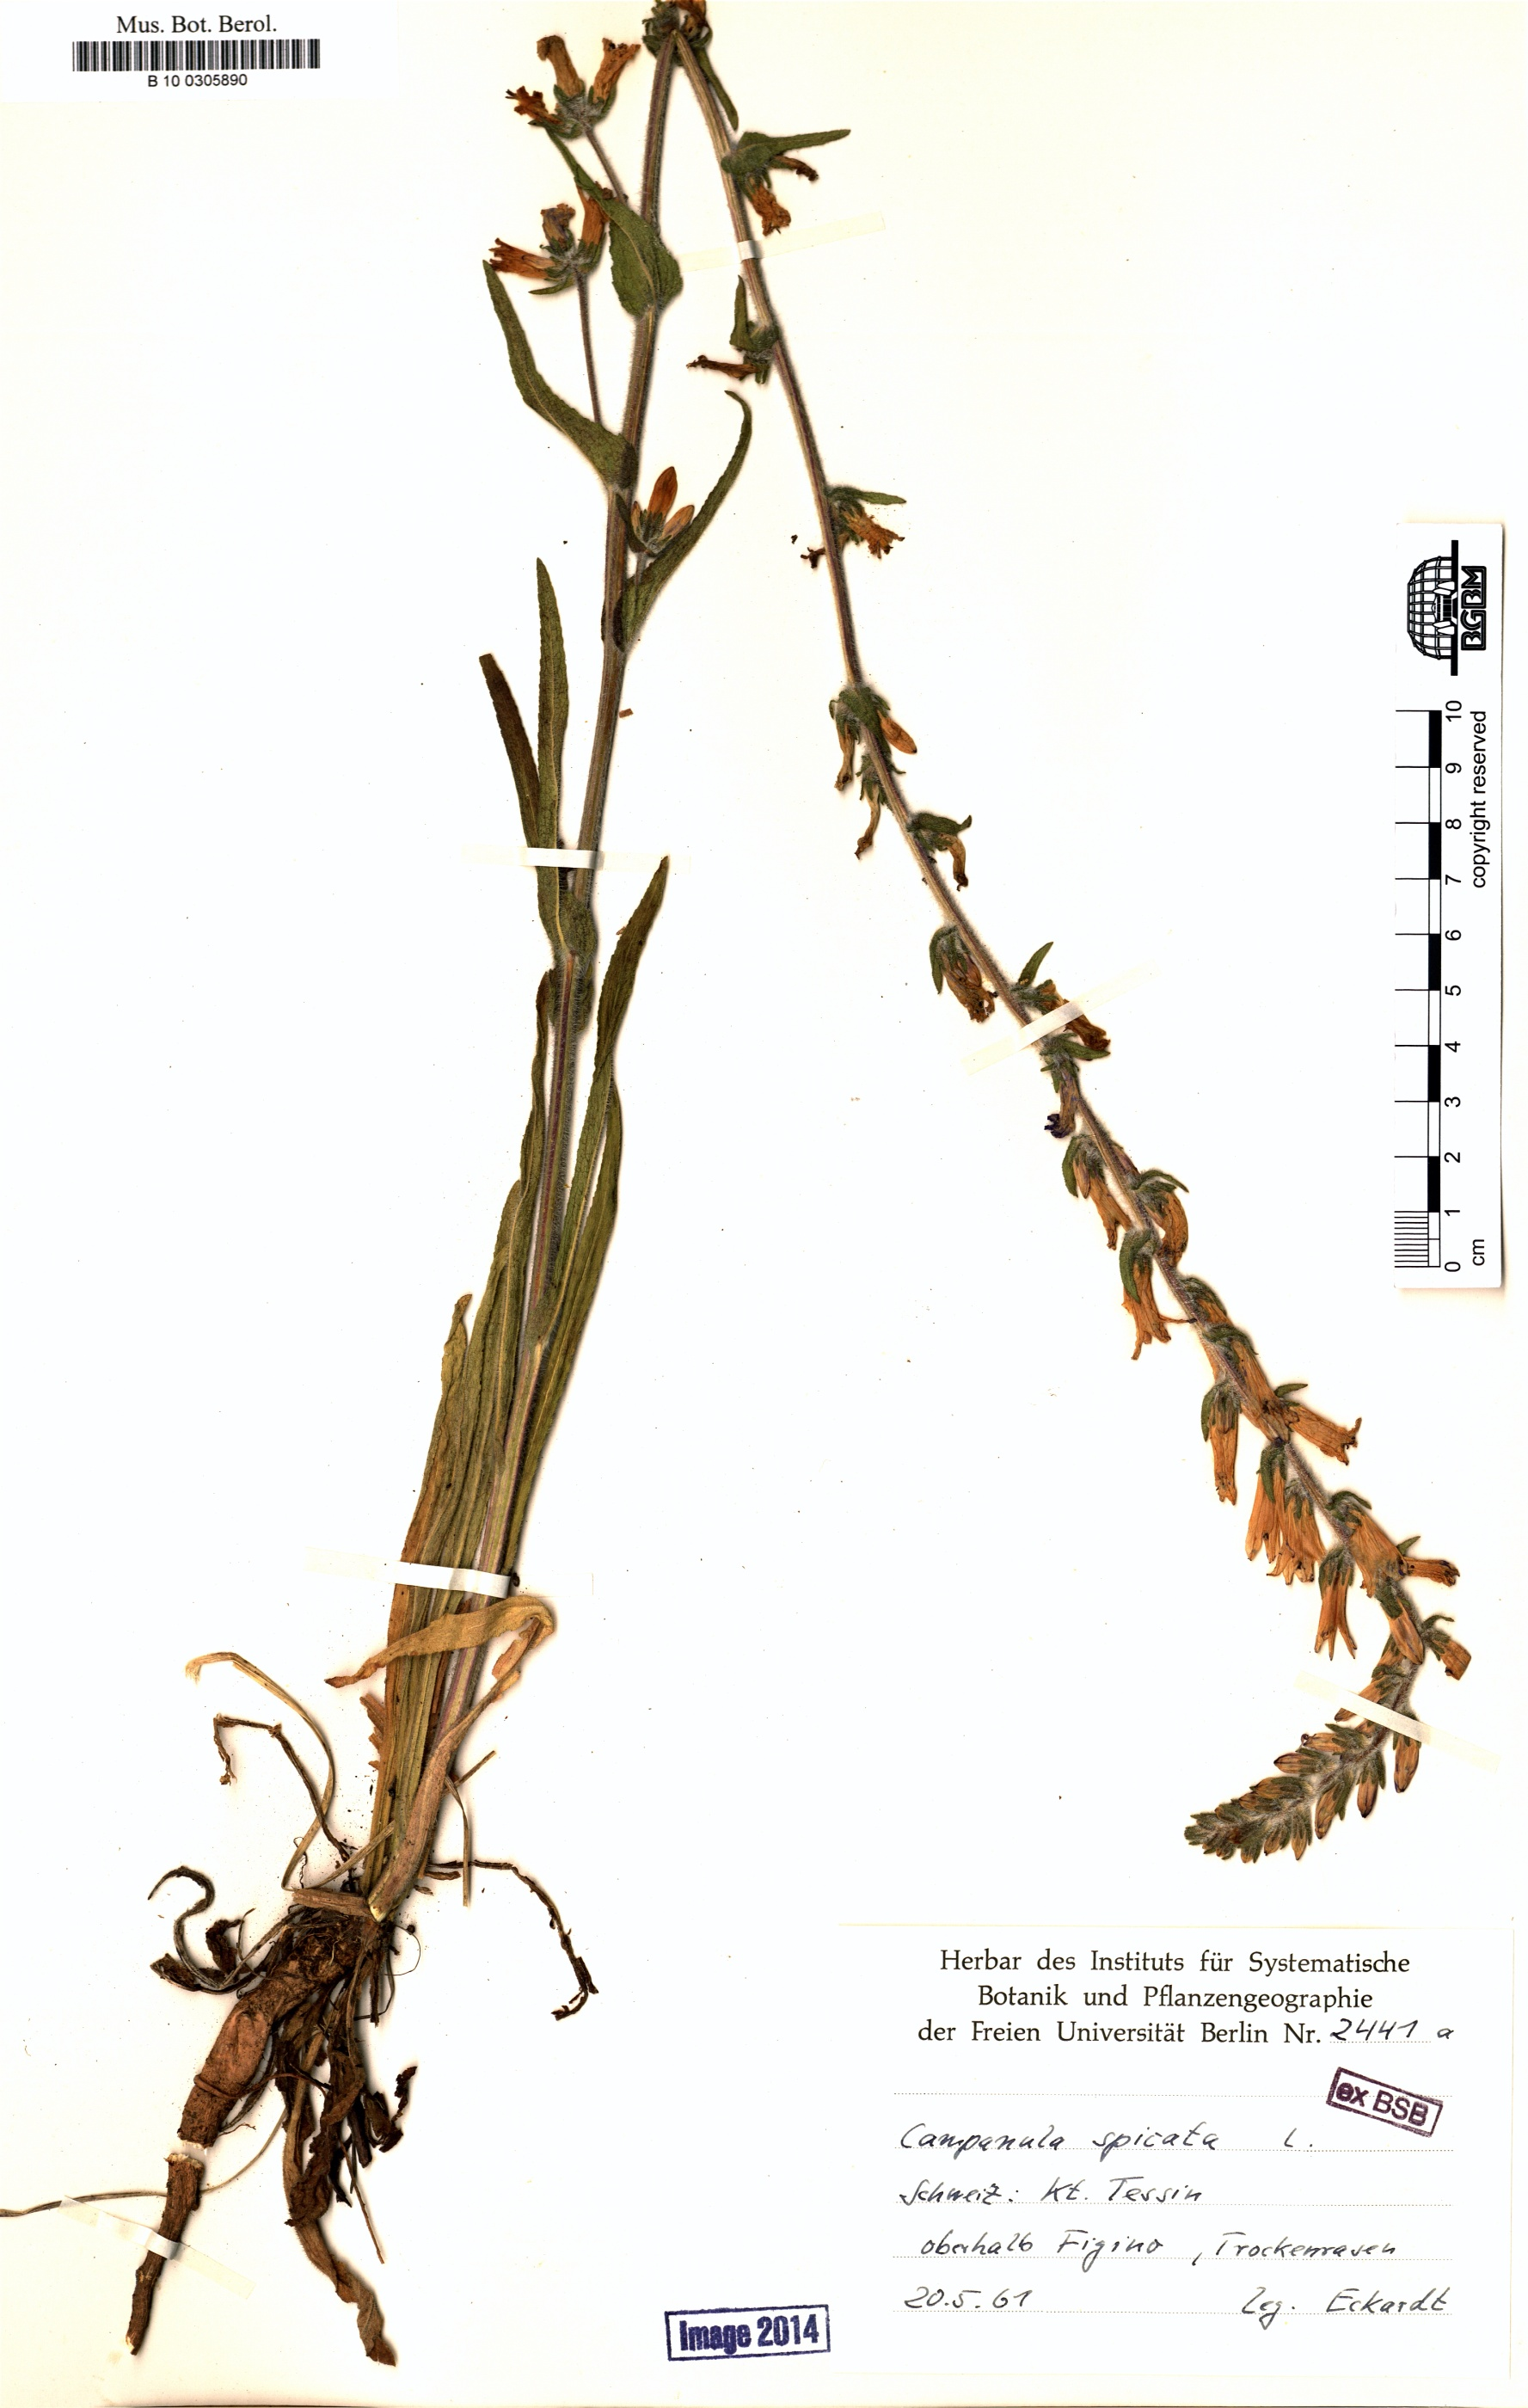 http://ww2.bgbm.org/herbarium/images/B/10/03/05/89/B_10_0305890.jpg